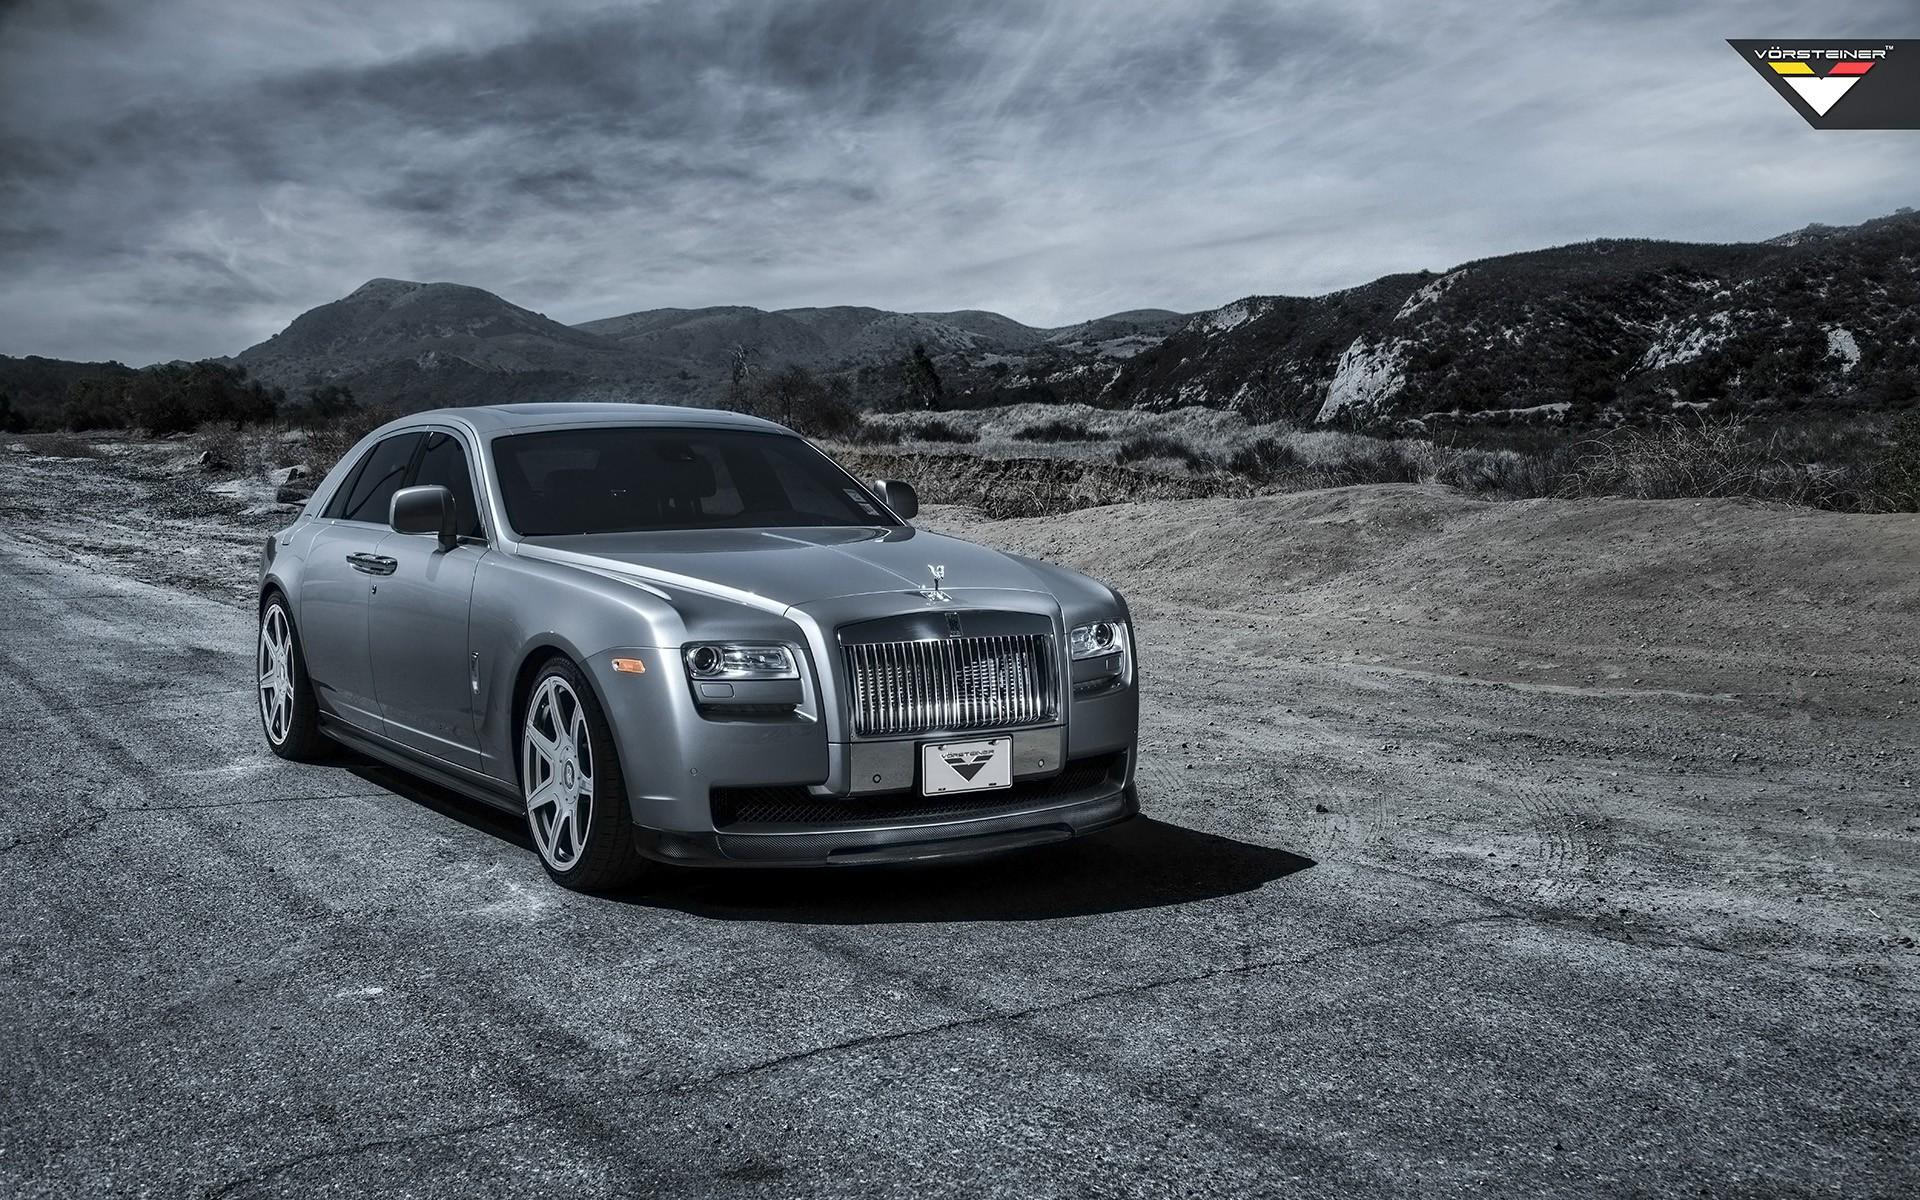 Rolls Royce Silver Ghost >> 2014 Rolls Royce Ghost Silver By Vorsteiner Wallpaper | HD Car Wallpapers | ID #4530